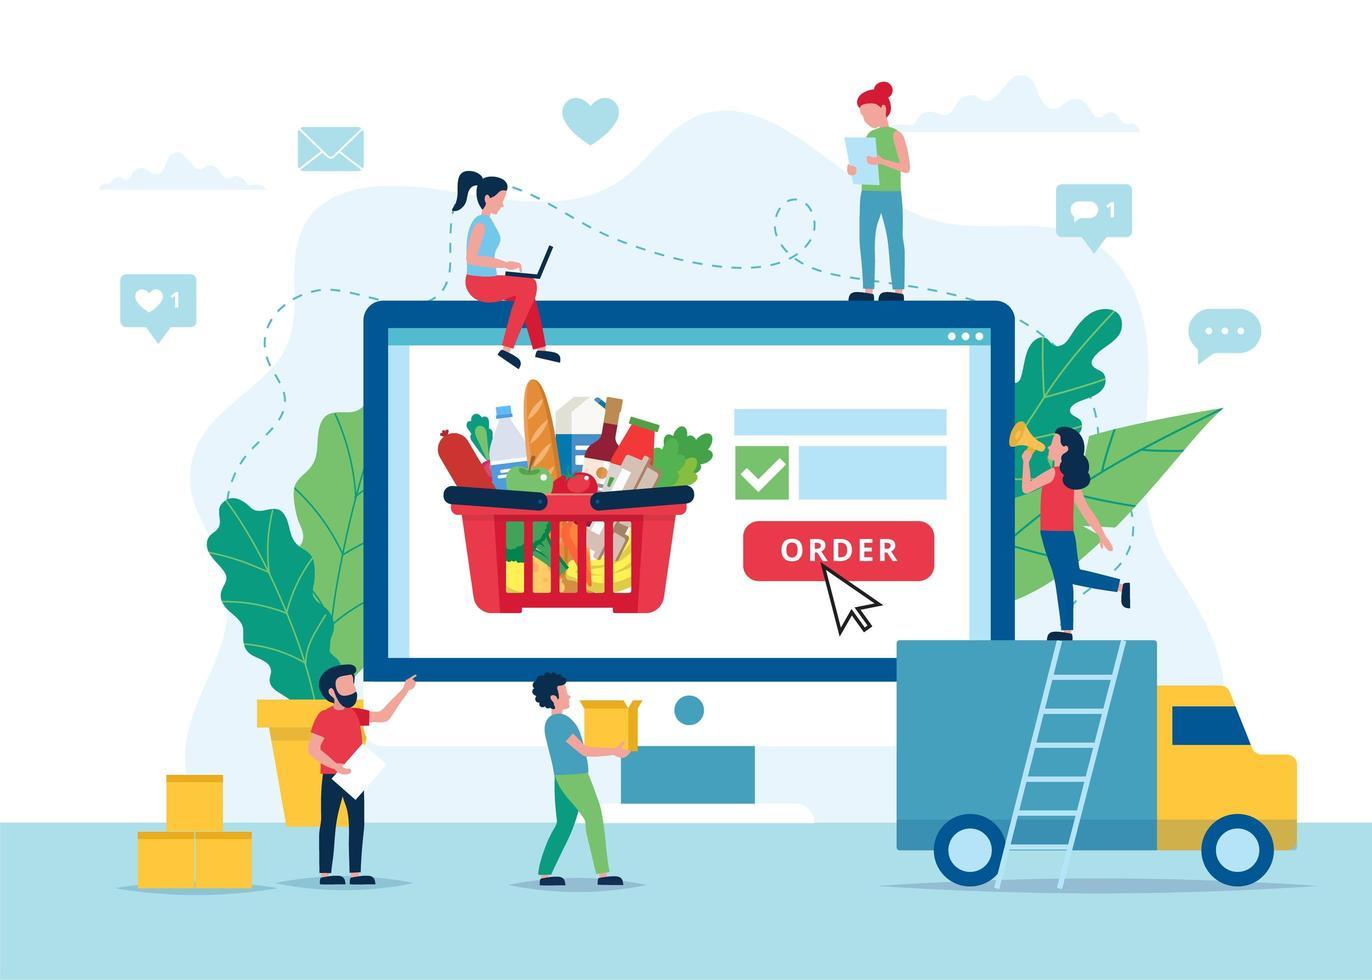 concepto de entrega de comestibles en línea vector